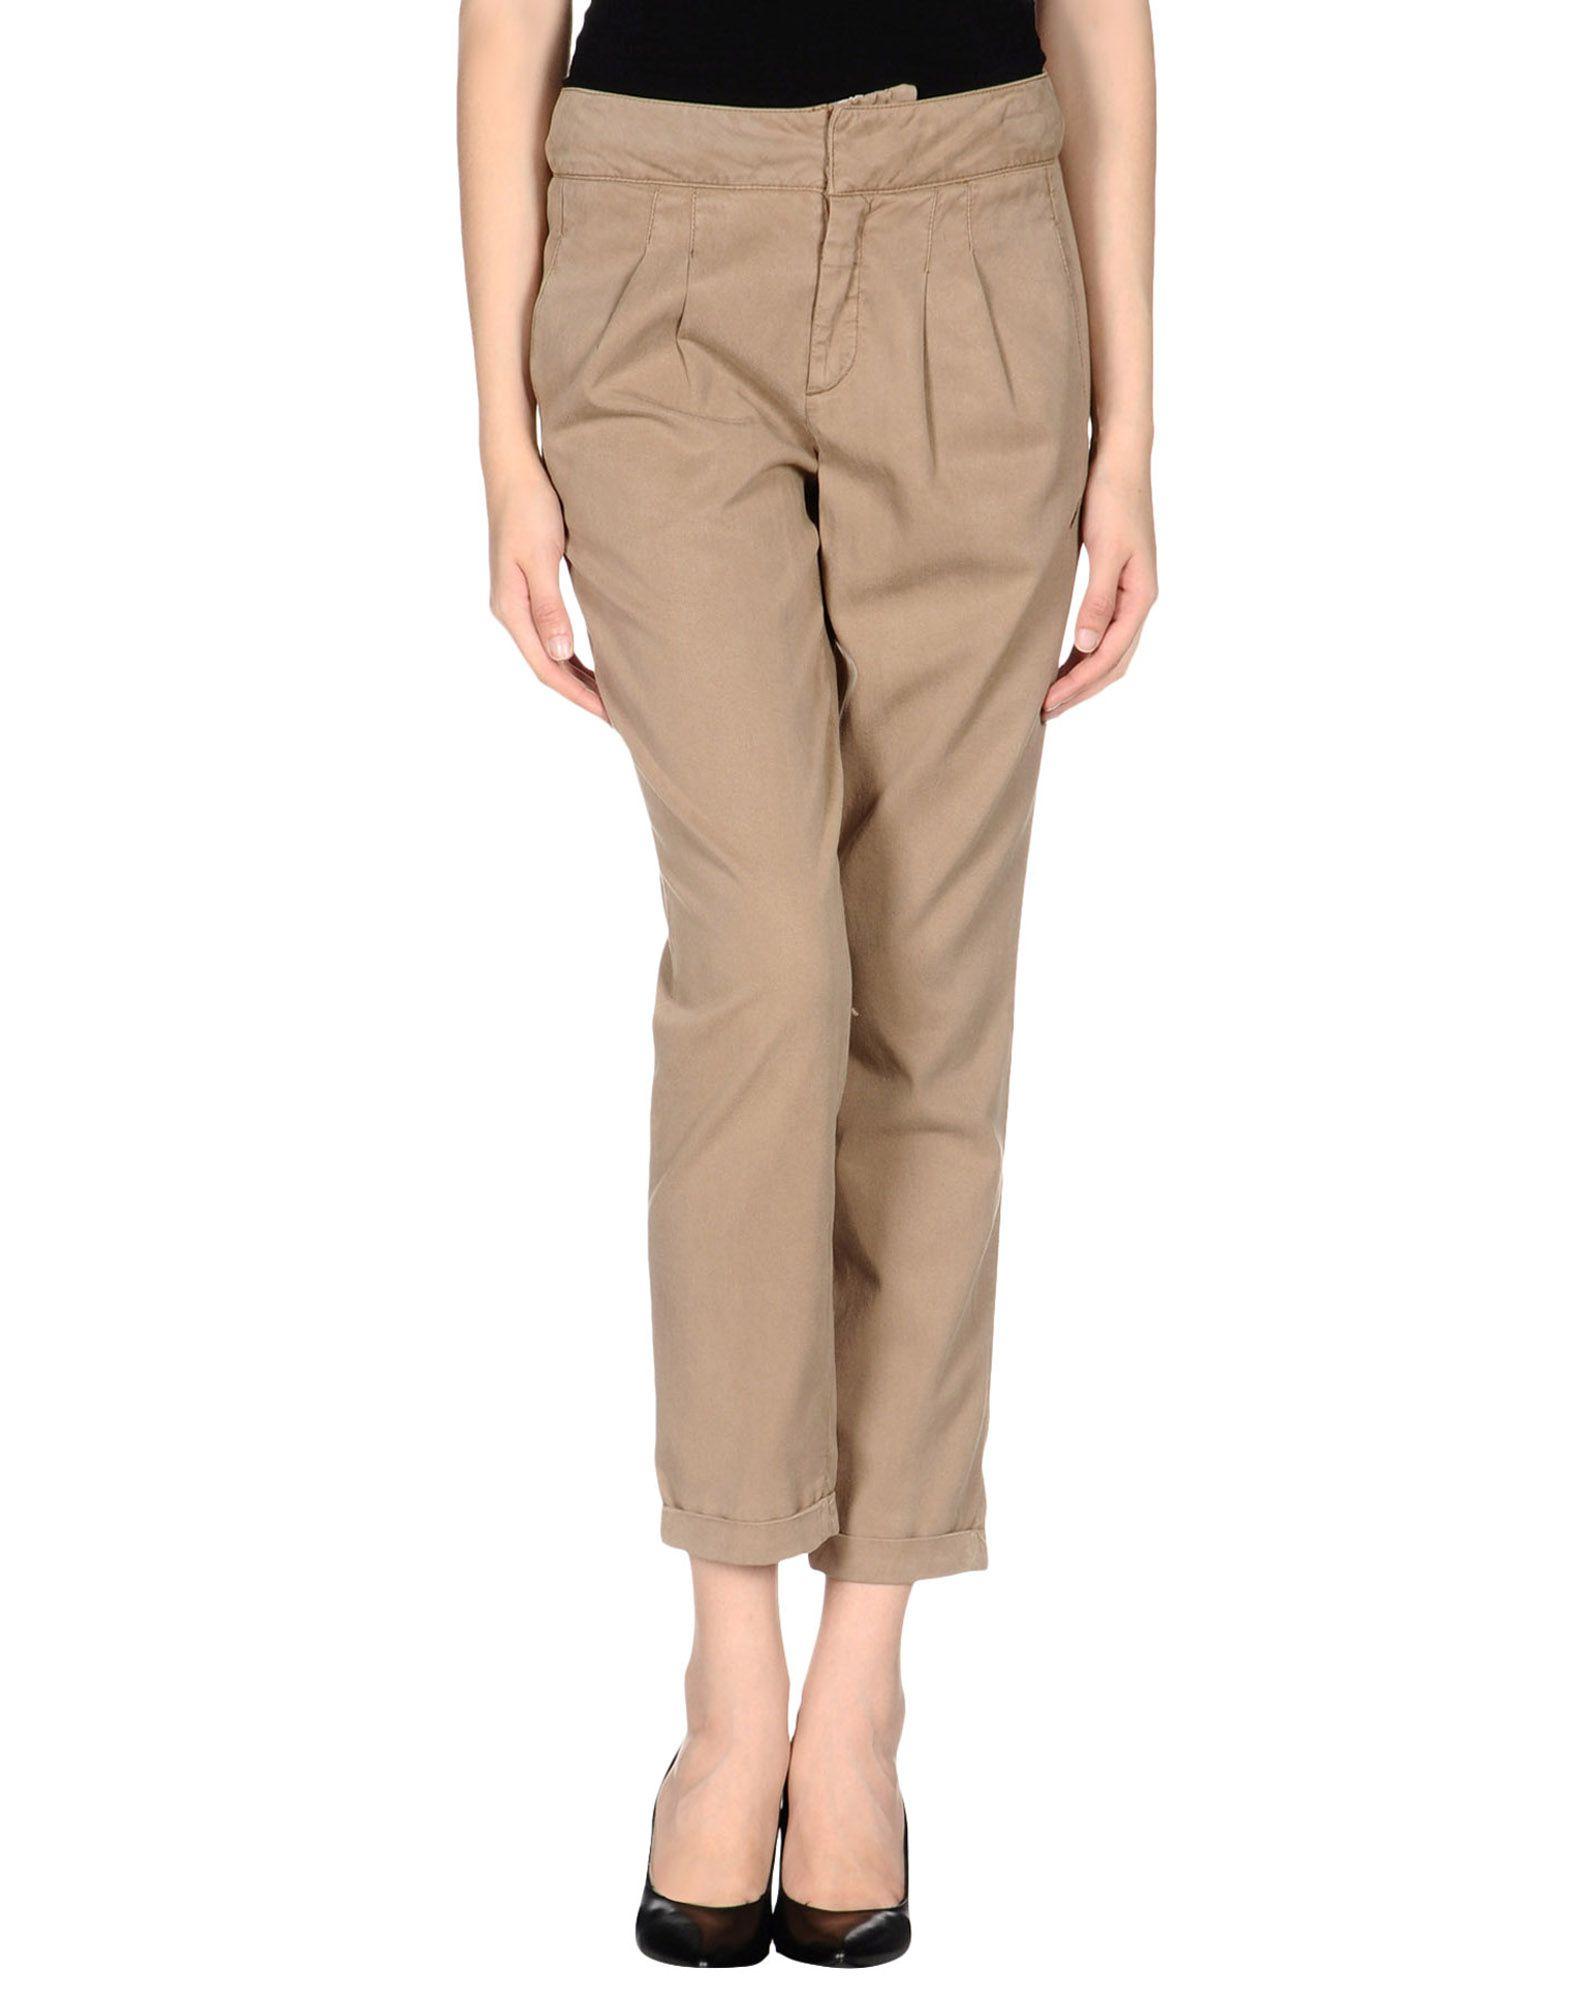 'Jeckerson Casual Pants